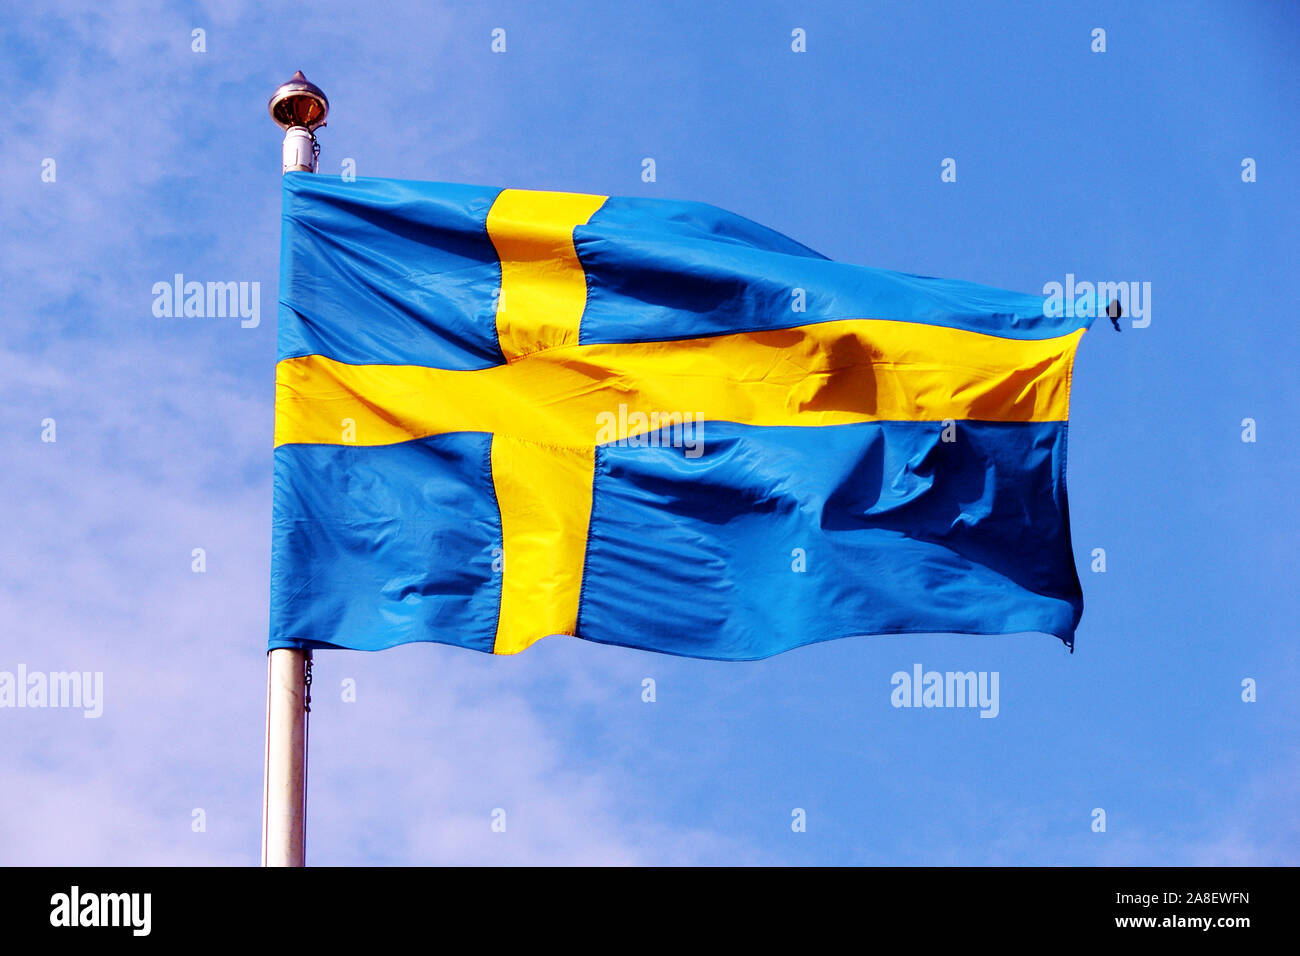 ,Schweden Stockholm Fahne, Landesfahne, Fahnenmast, Flagge, Flaggenmast, Stock Photo